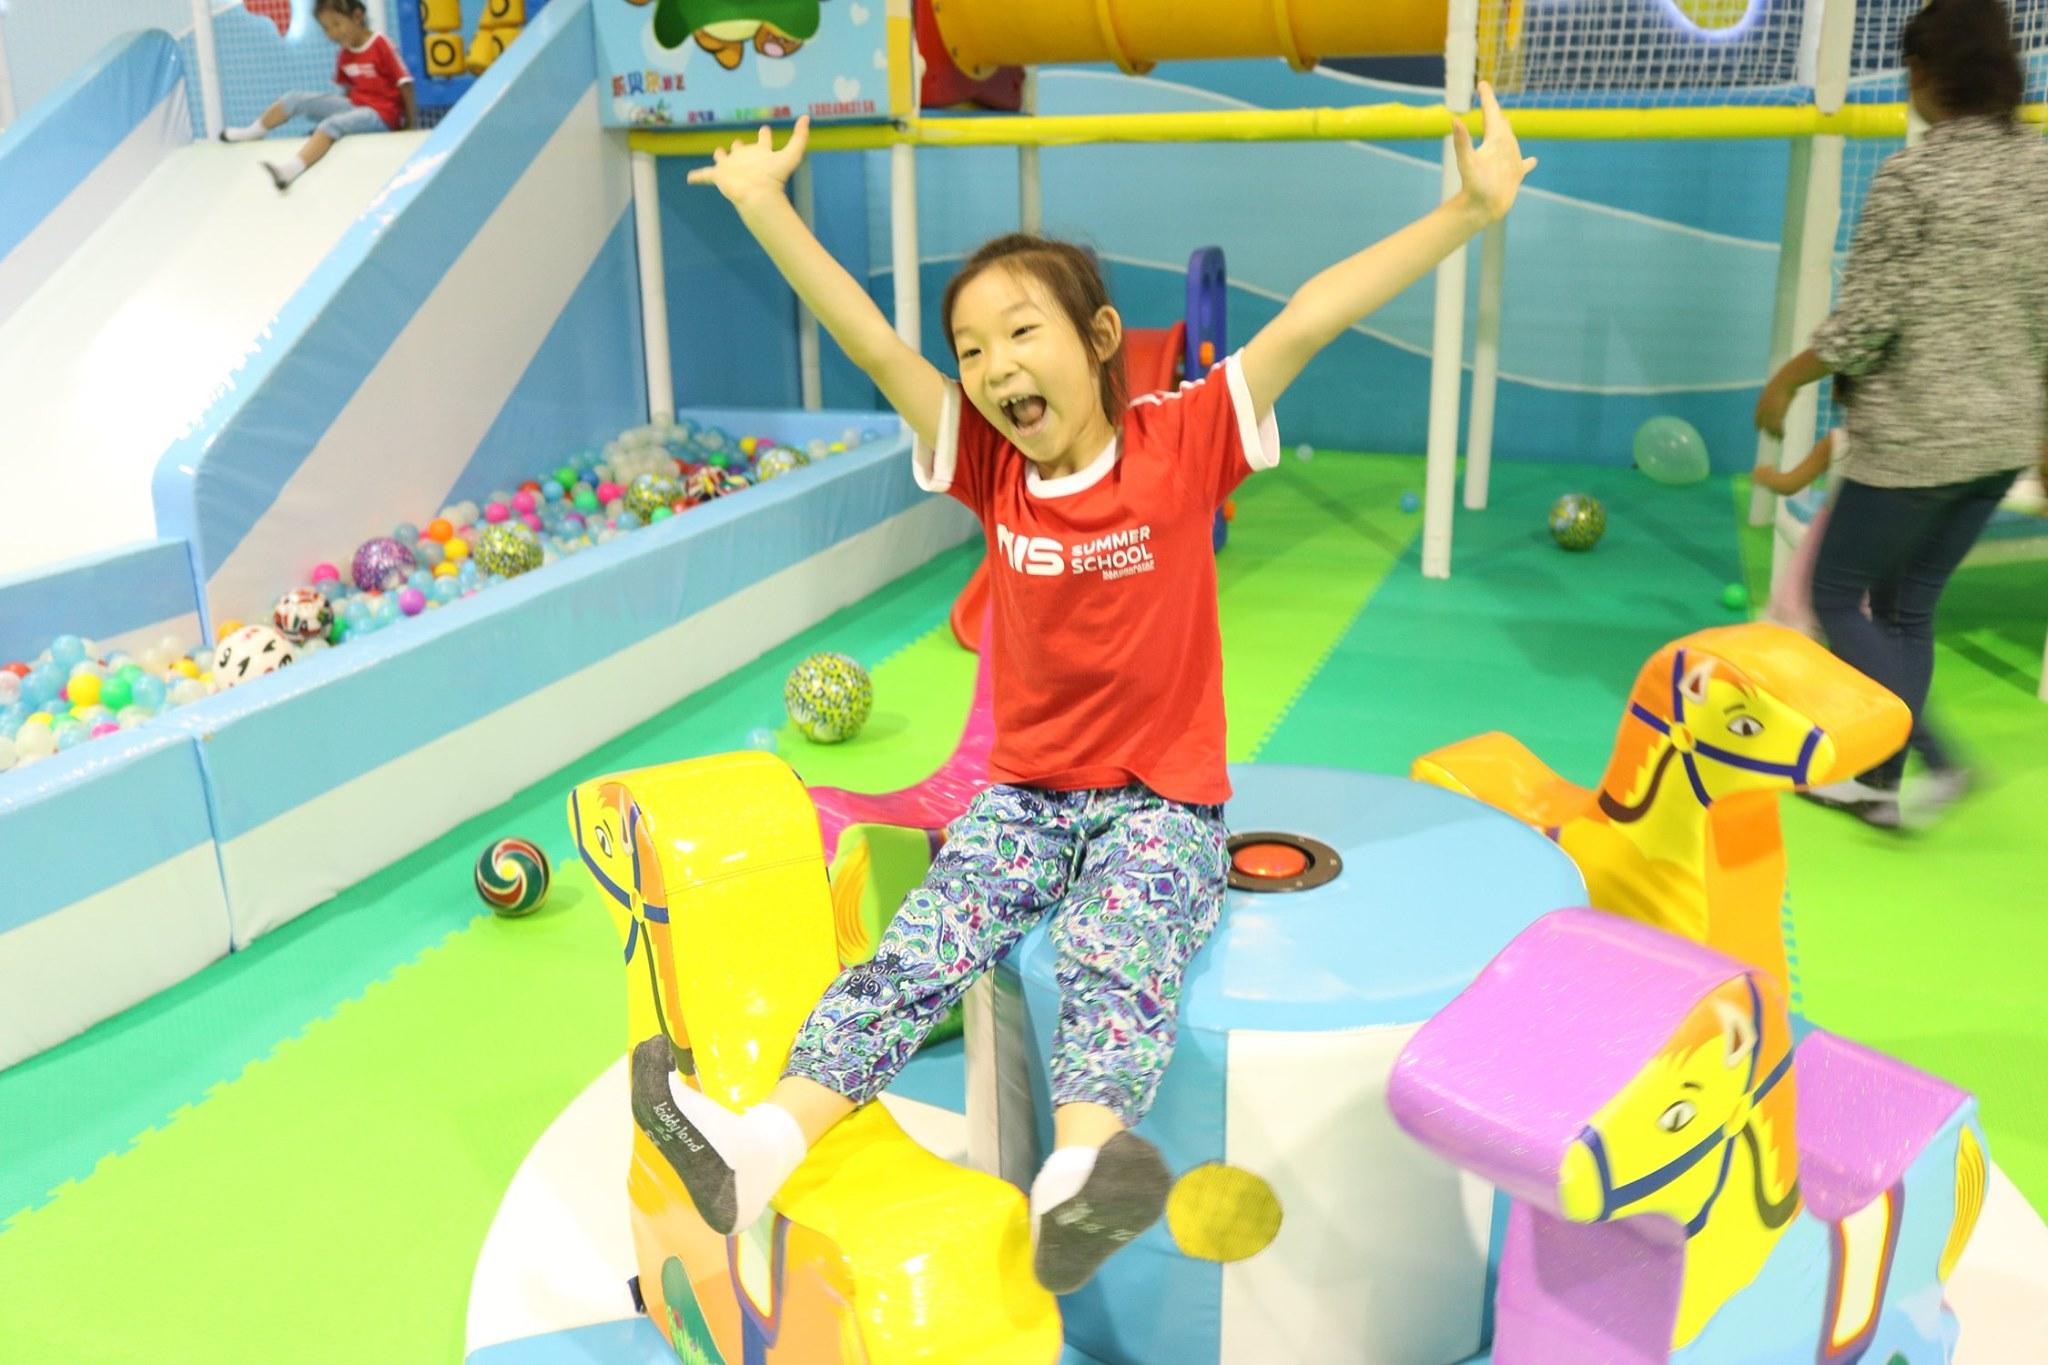 NIS-Summer-School-2019-Day-24-Kiddy-Land-29